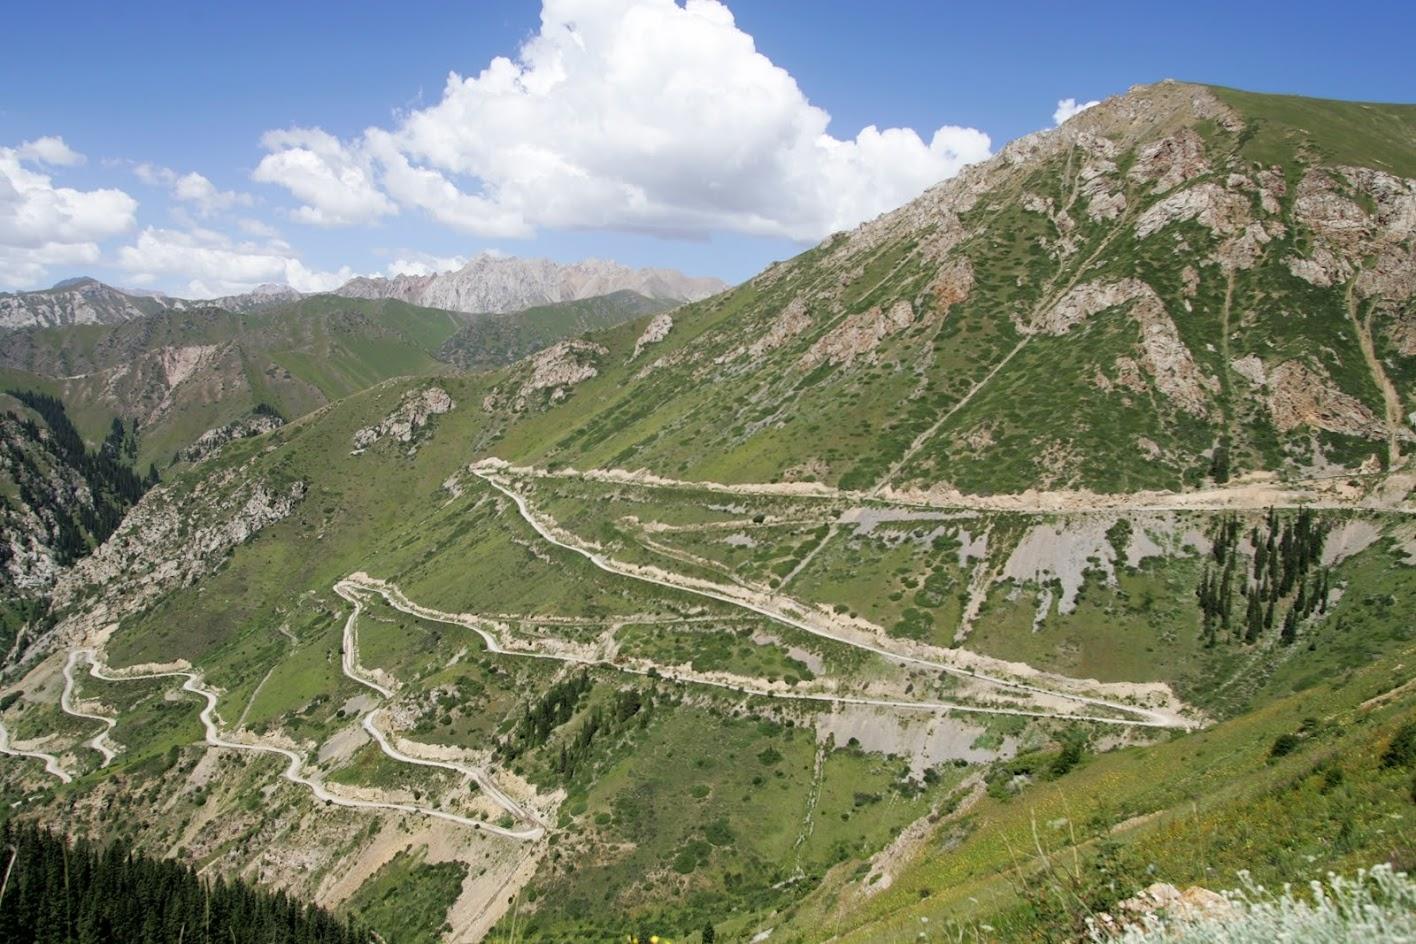 motocyklowa podróż do kirgistanu